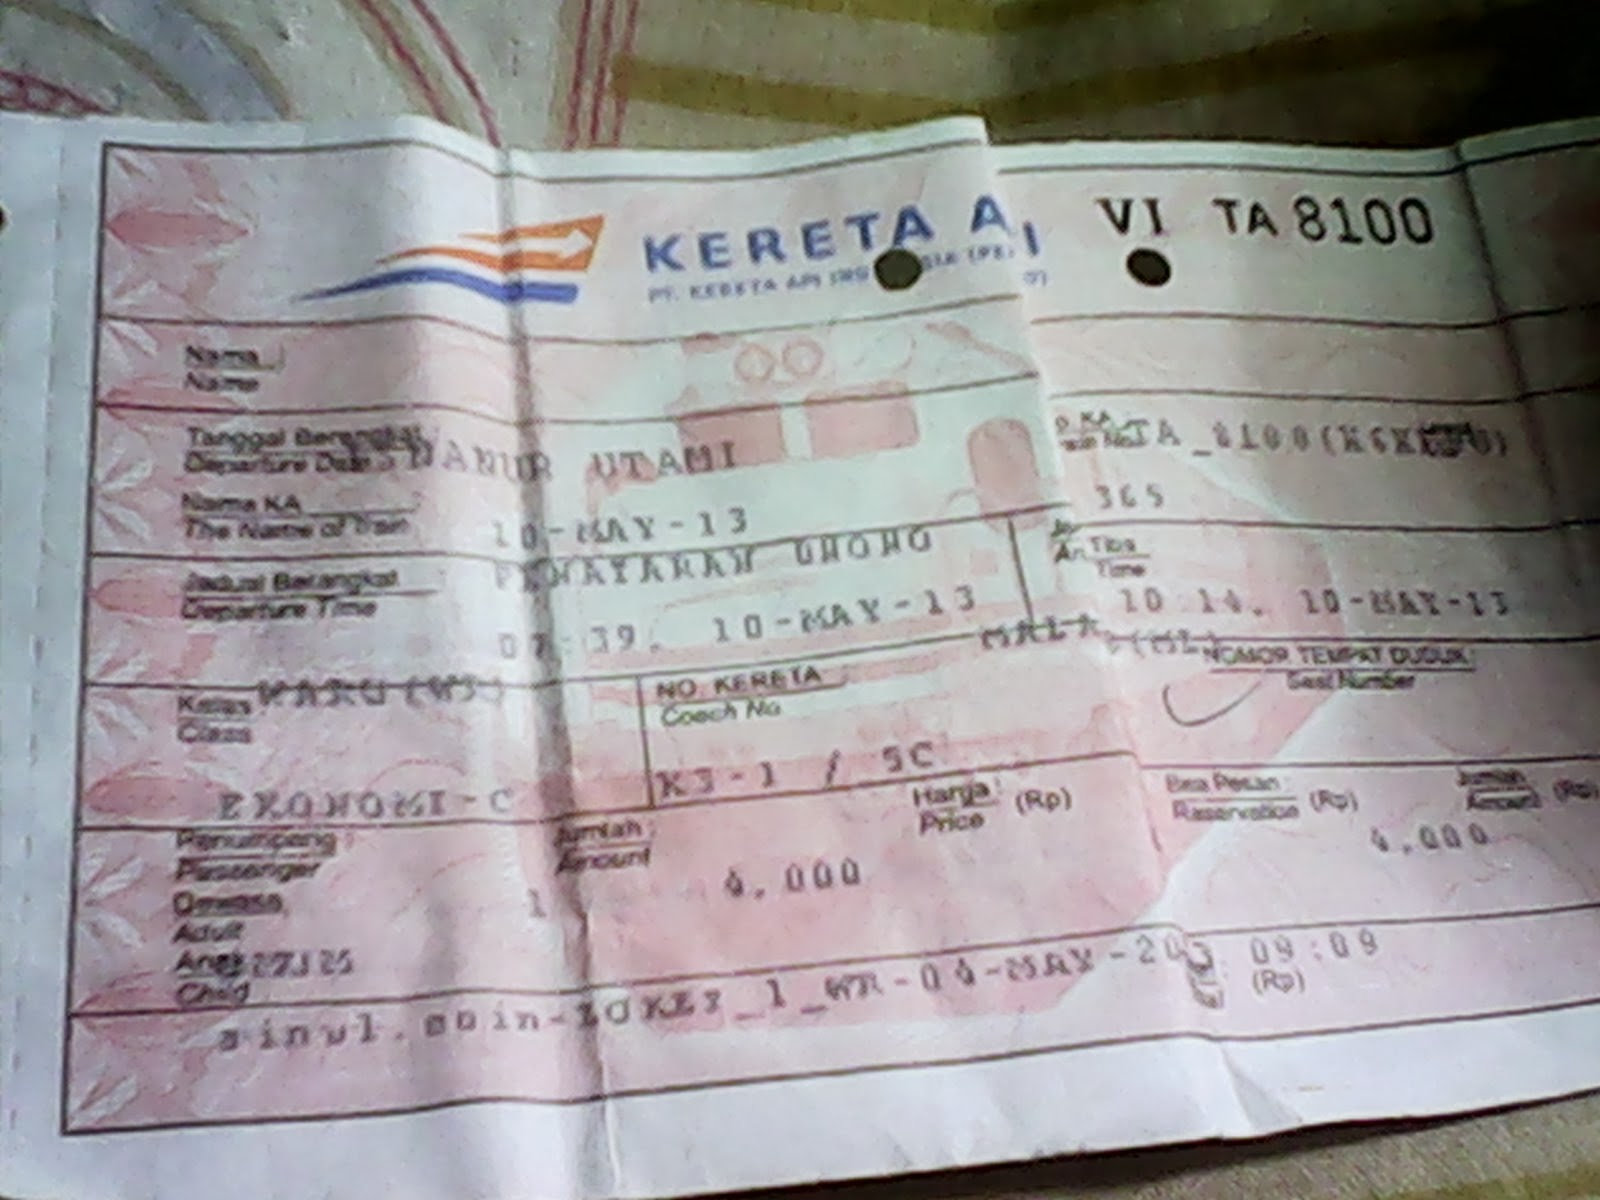 Tiket KA penataran yang dibeli di Stasiun Waru